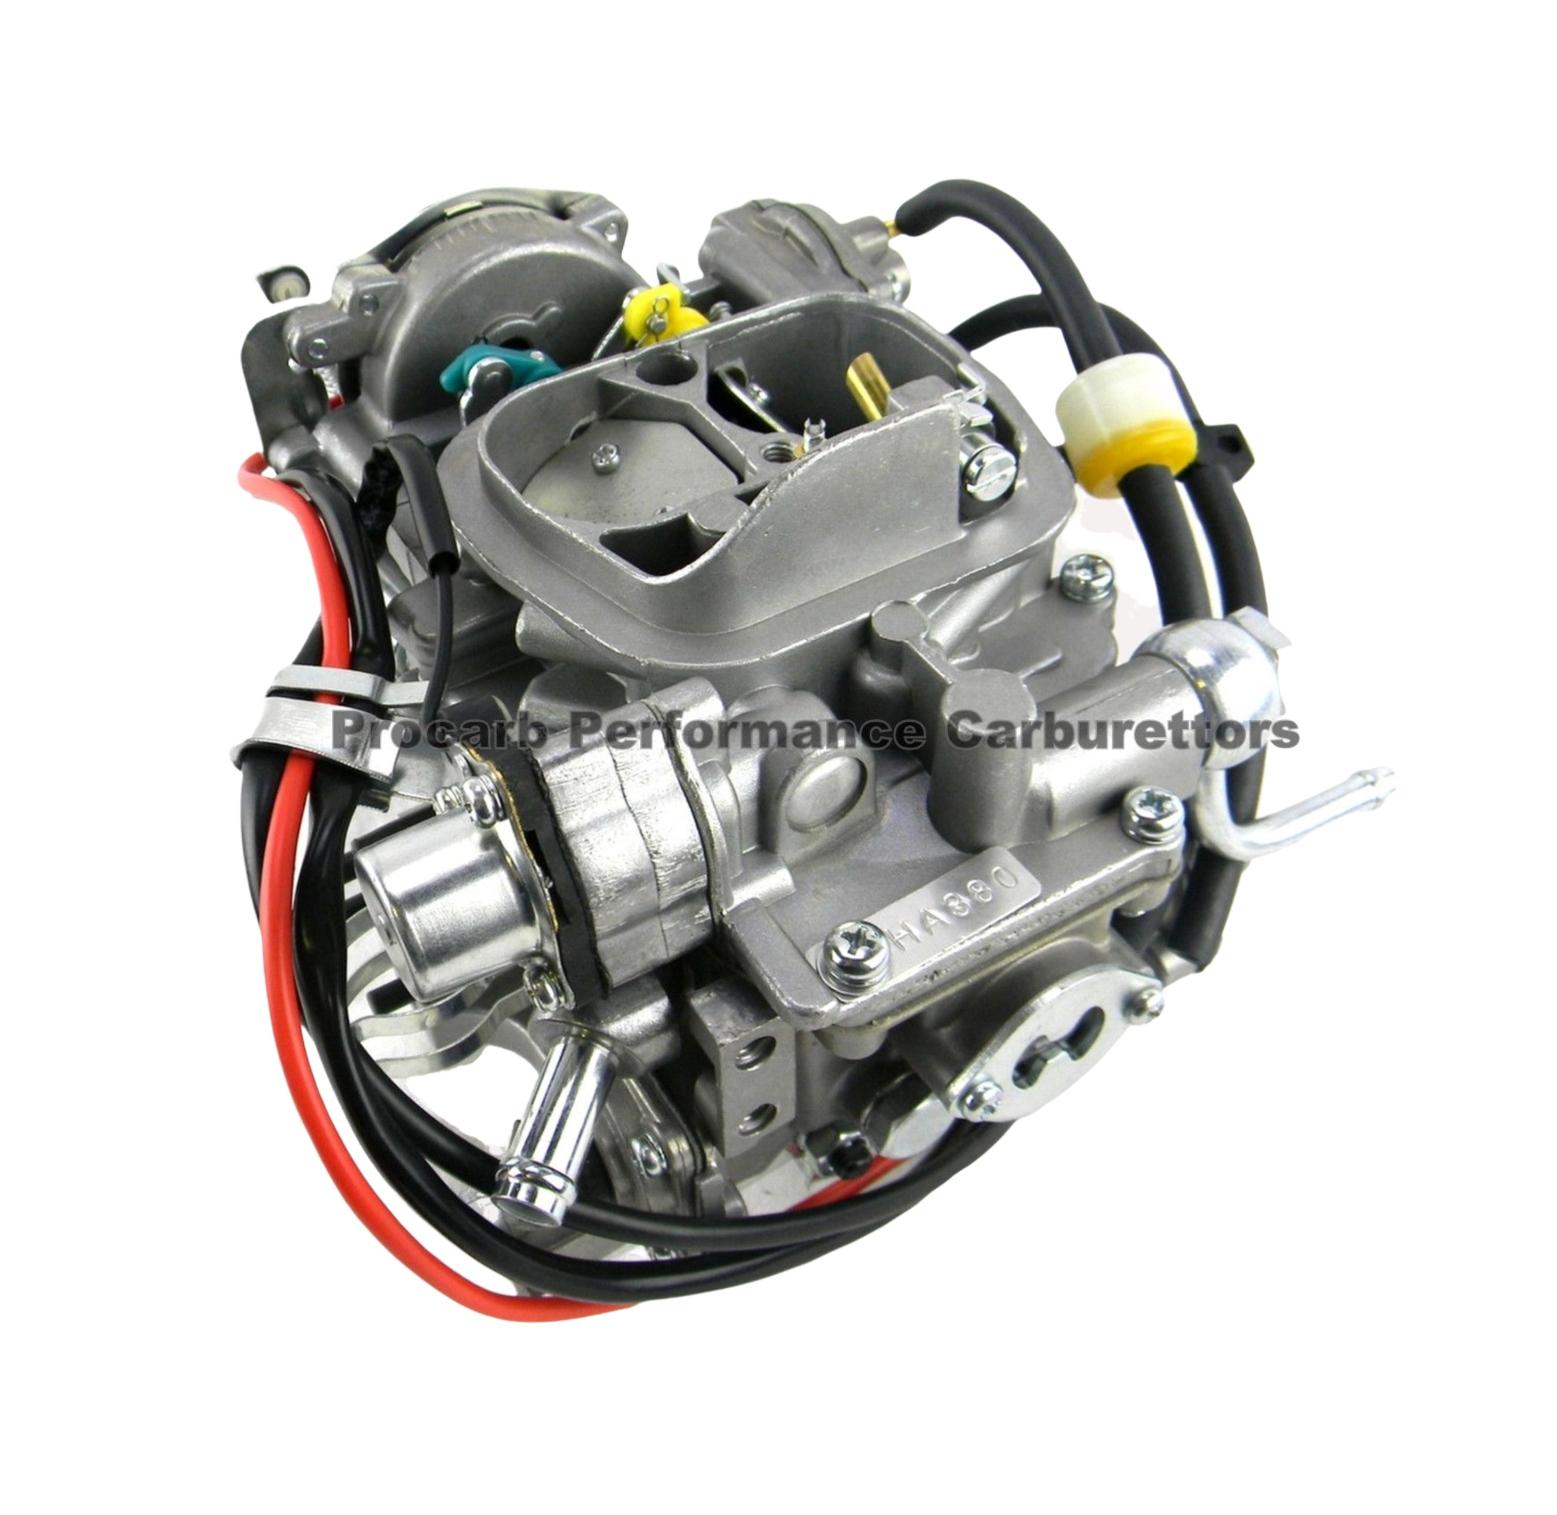 toyota-22r-carburettor.jpg